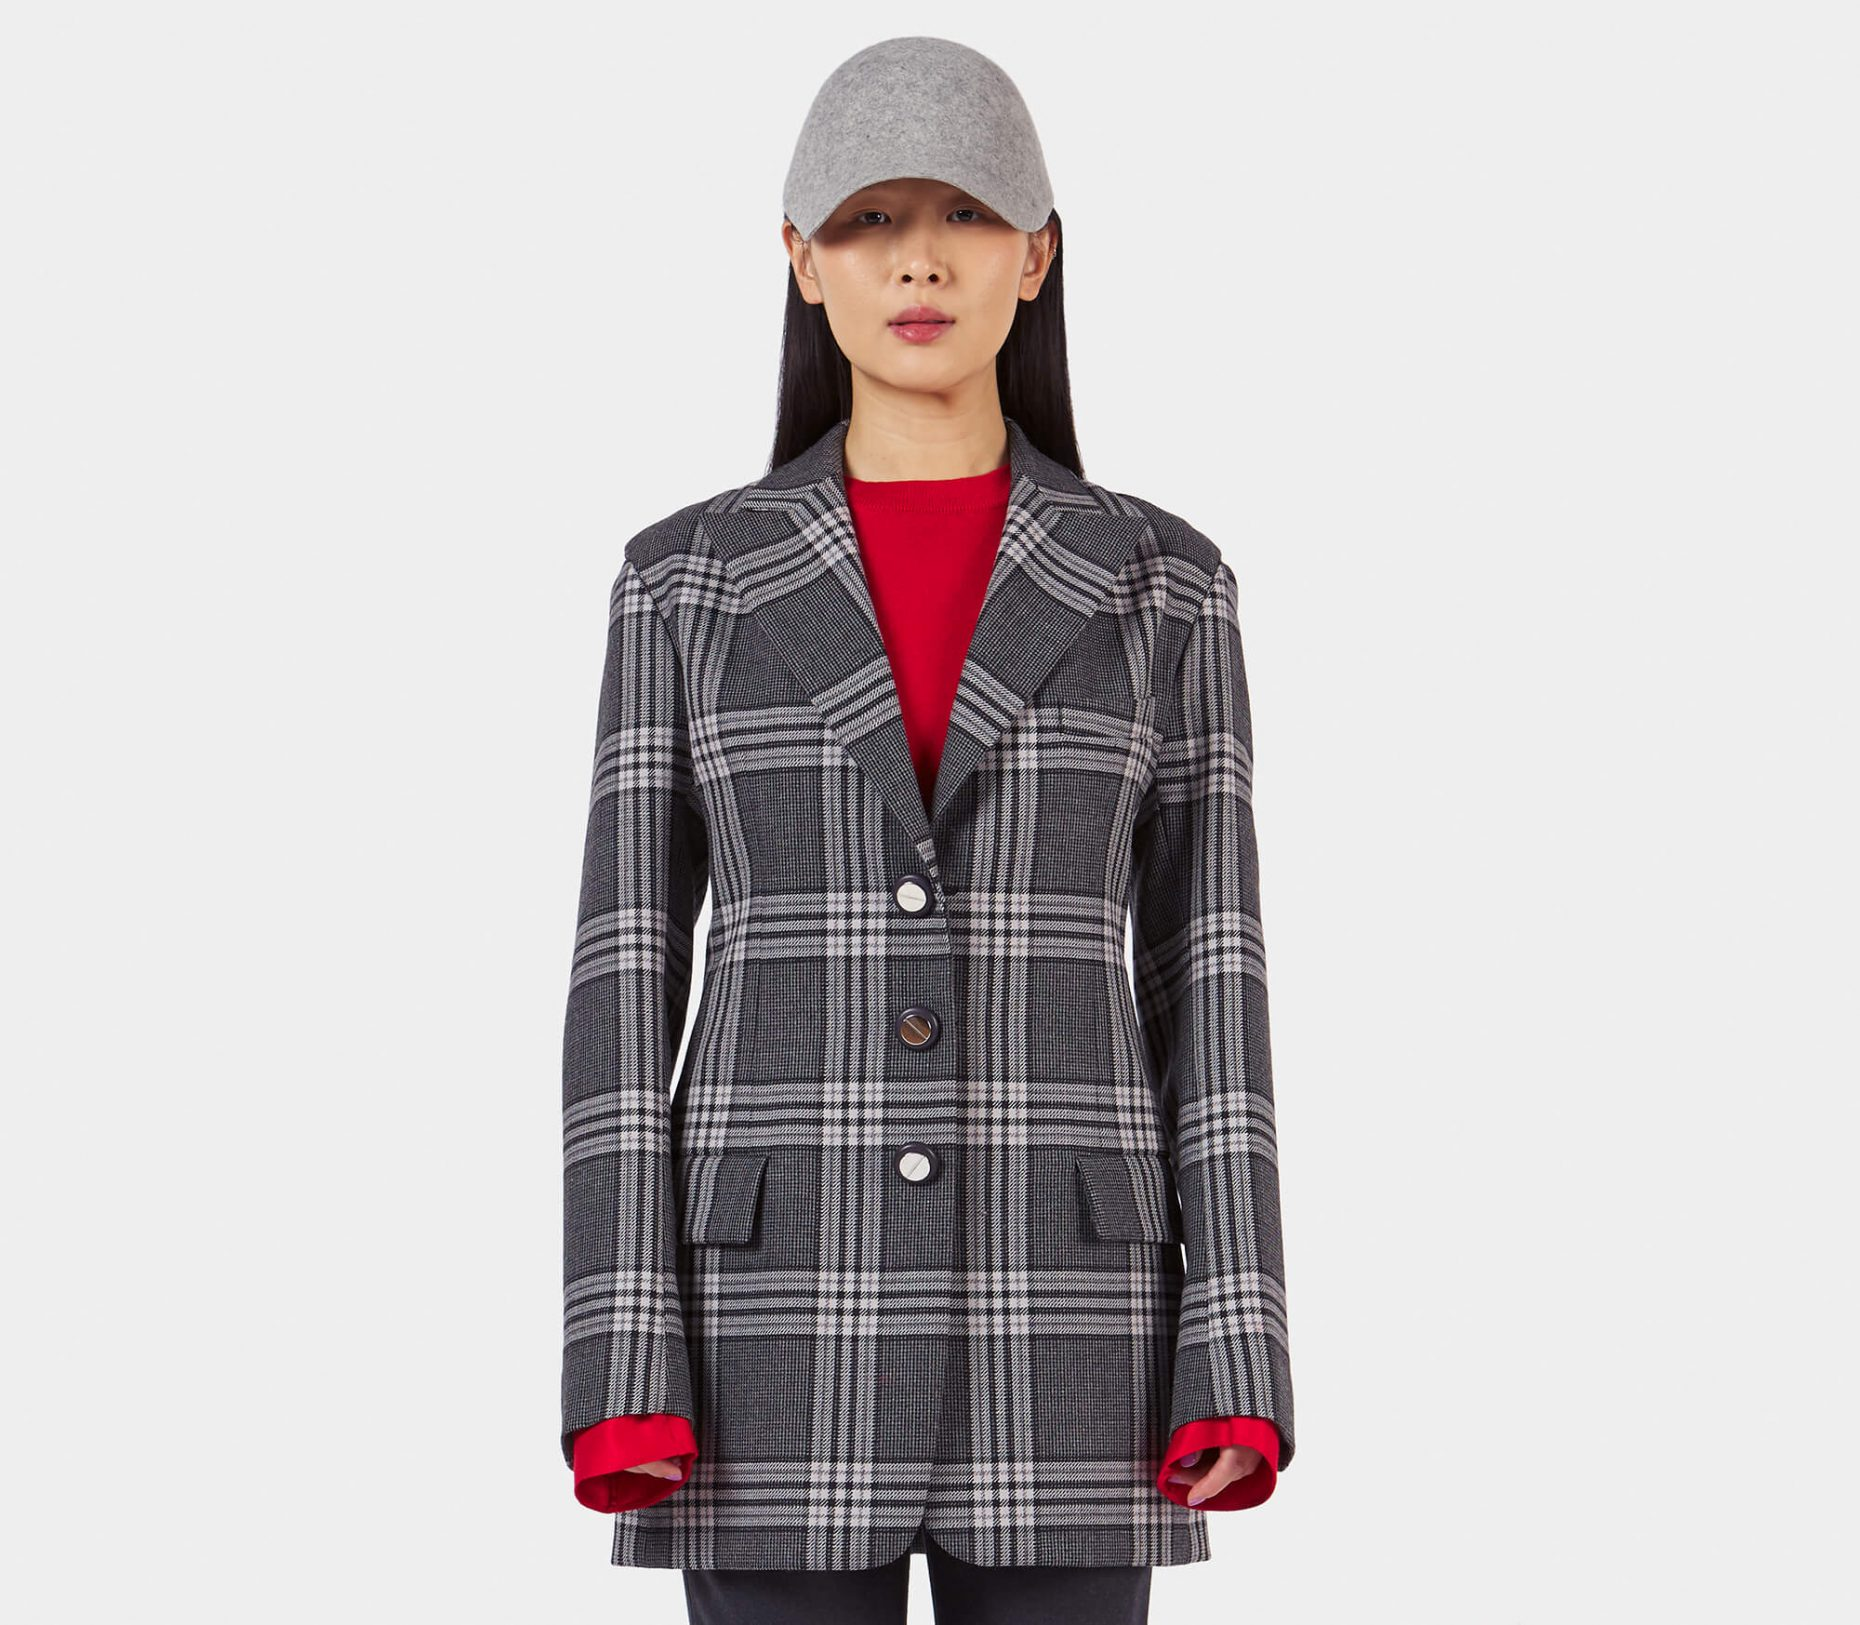 Marni Single Breasted Checkered Wool Jacket